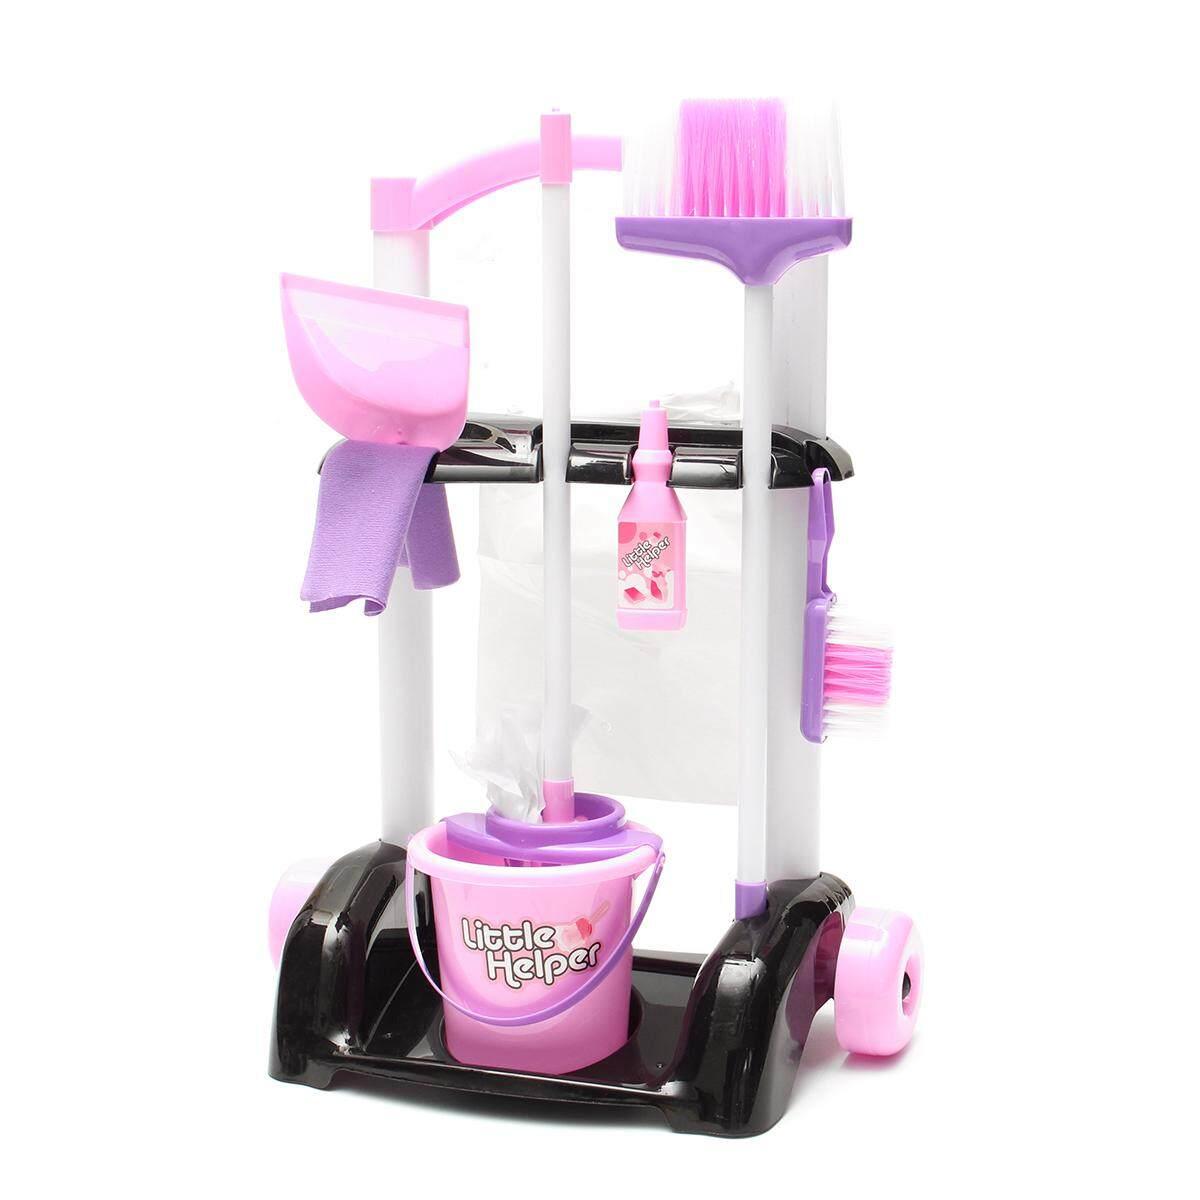 Hình ảnh Trolley Pretend Cleaning Set Kids Role Play Children Toy - intl